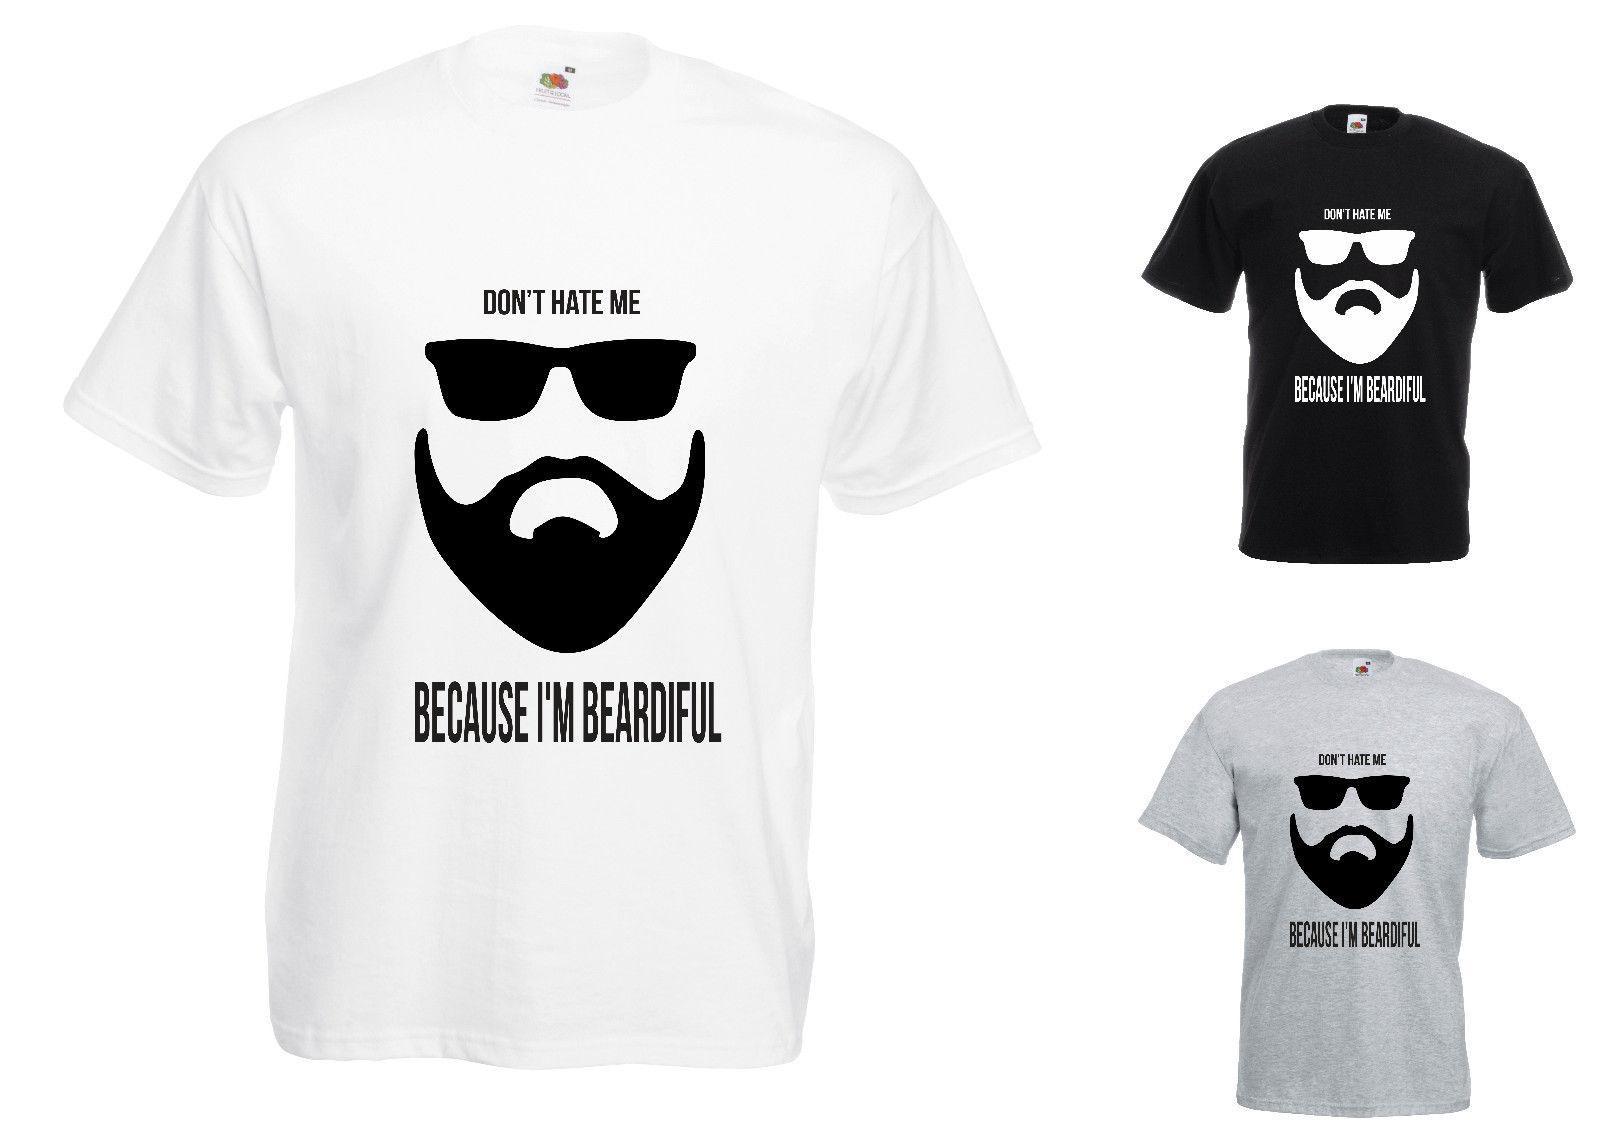 9eaa43f61 Don't Hate Me Cos I'm Beardiful Funny Printed T-Shirt Giftmens pride dark t- shirt